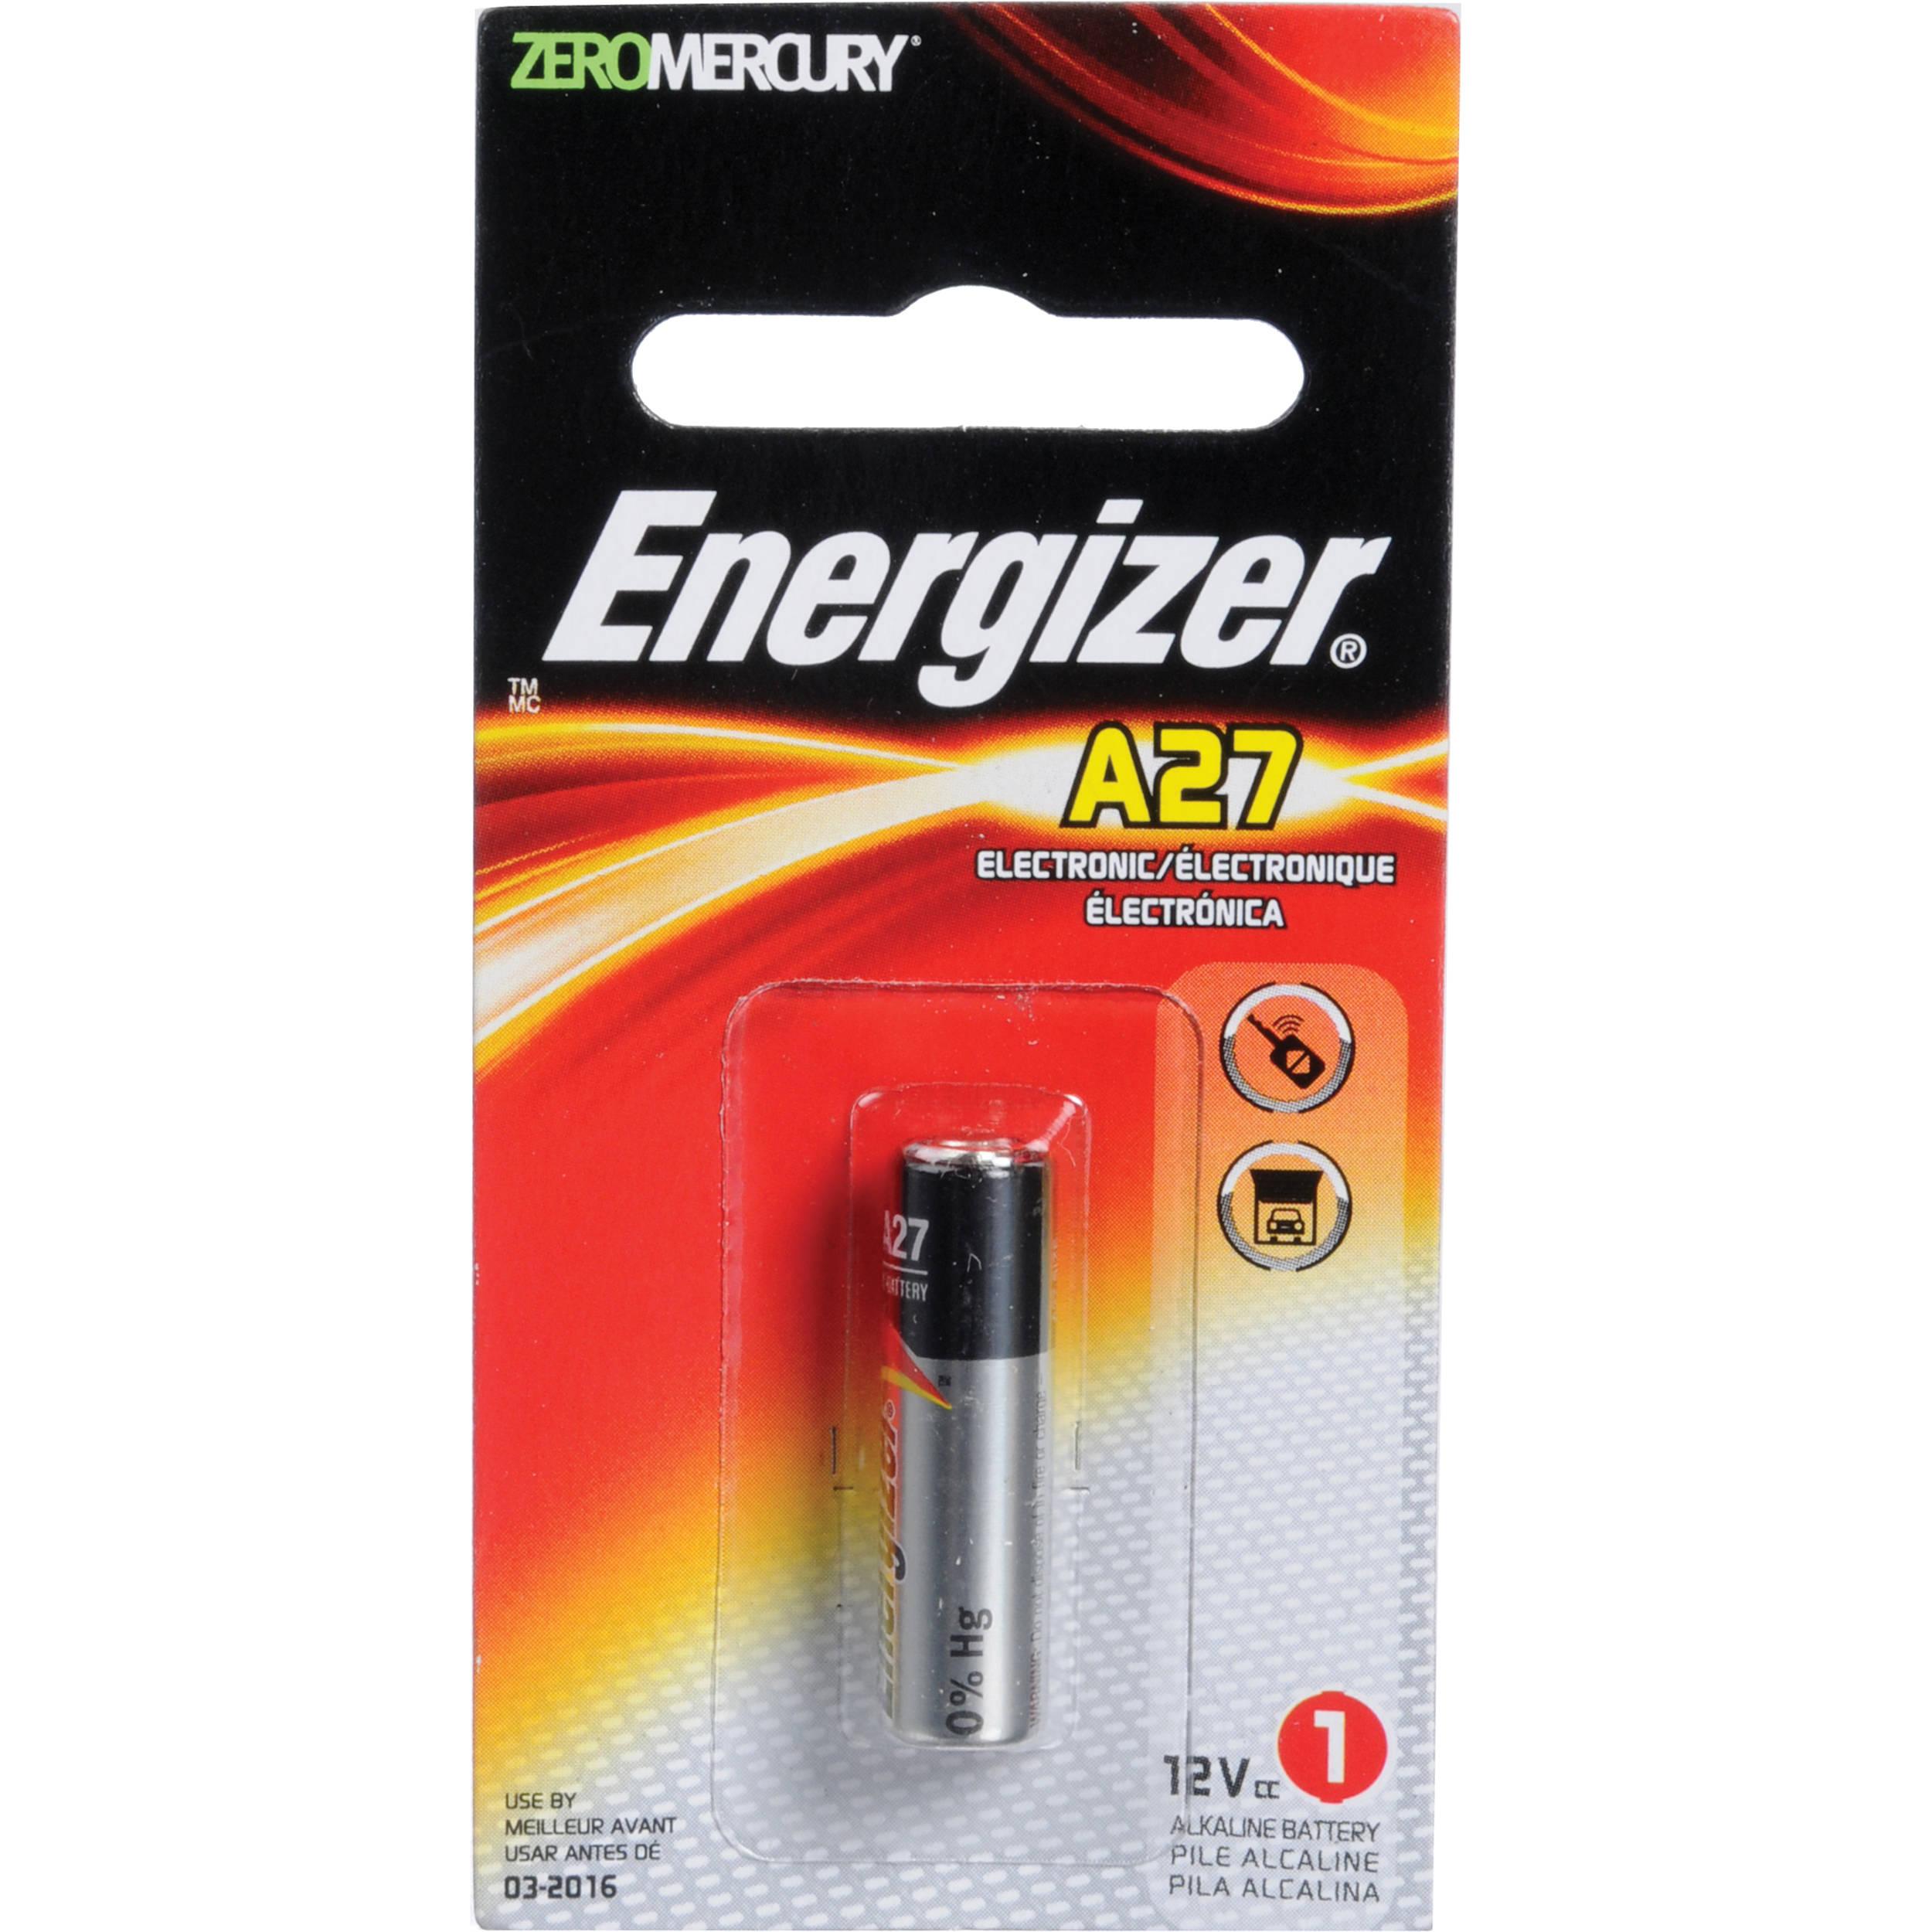 Energizer A27 12v Alkaline Battery A27 B Amp H Photo Video